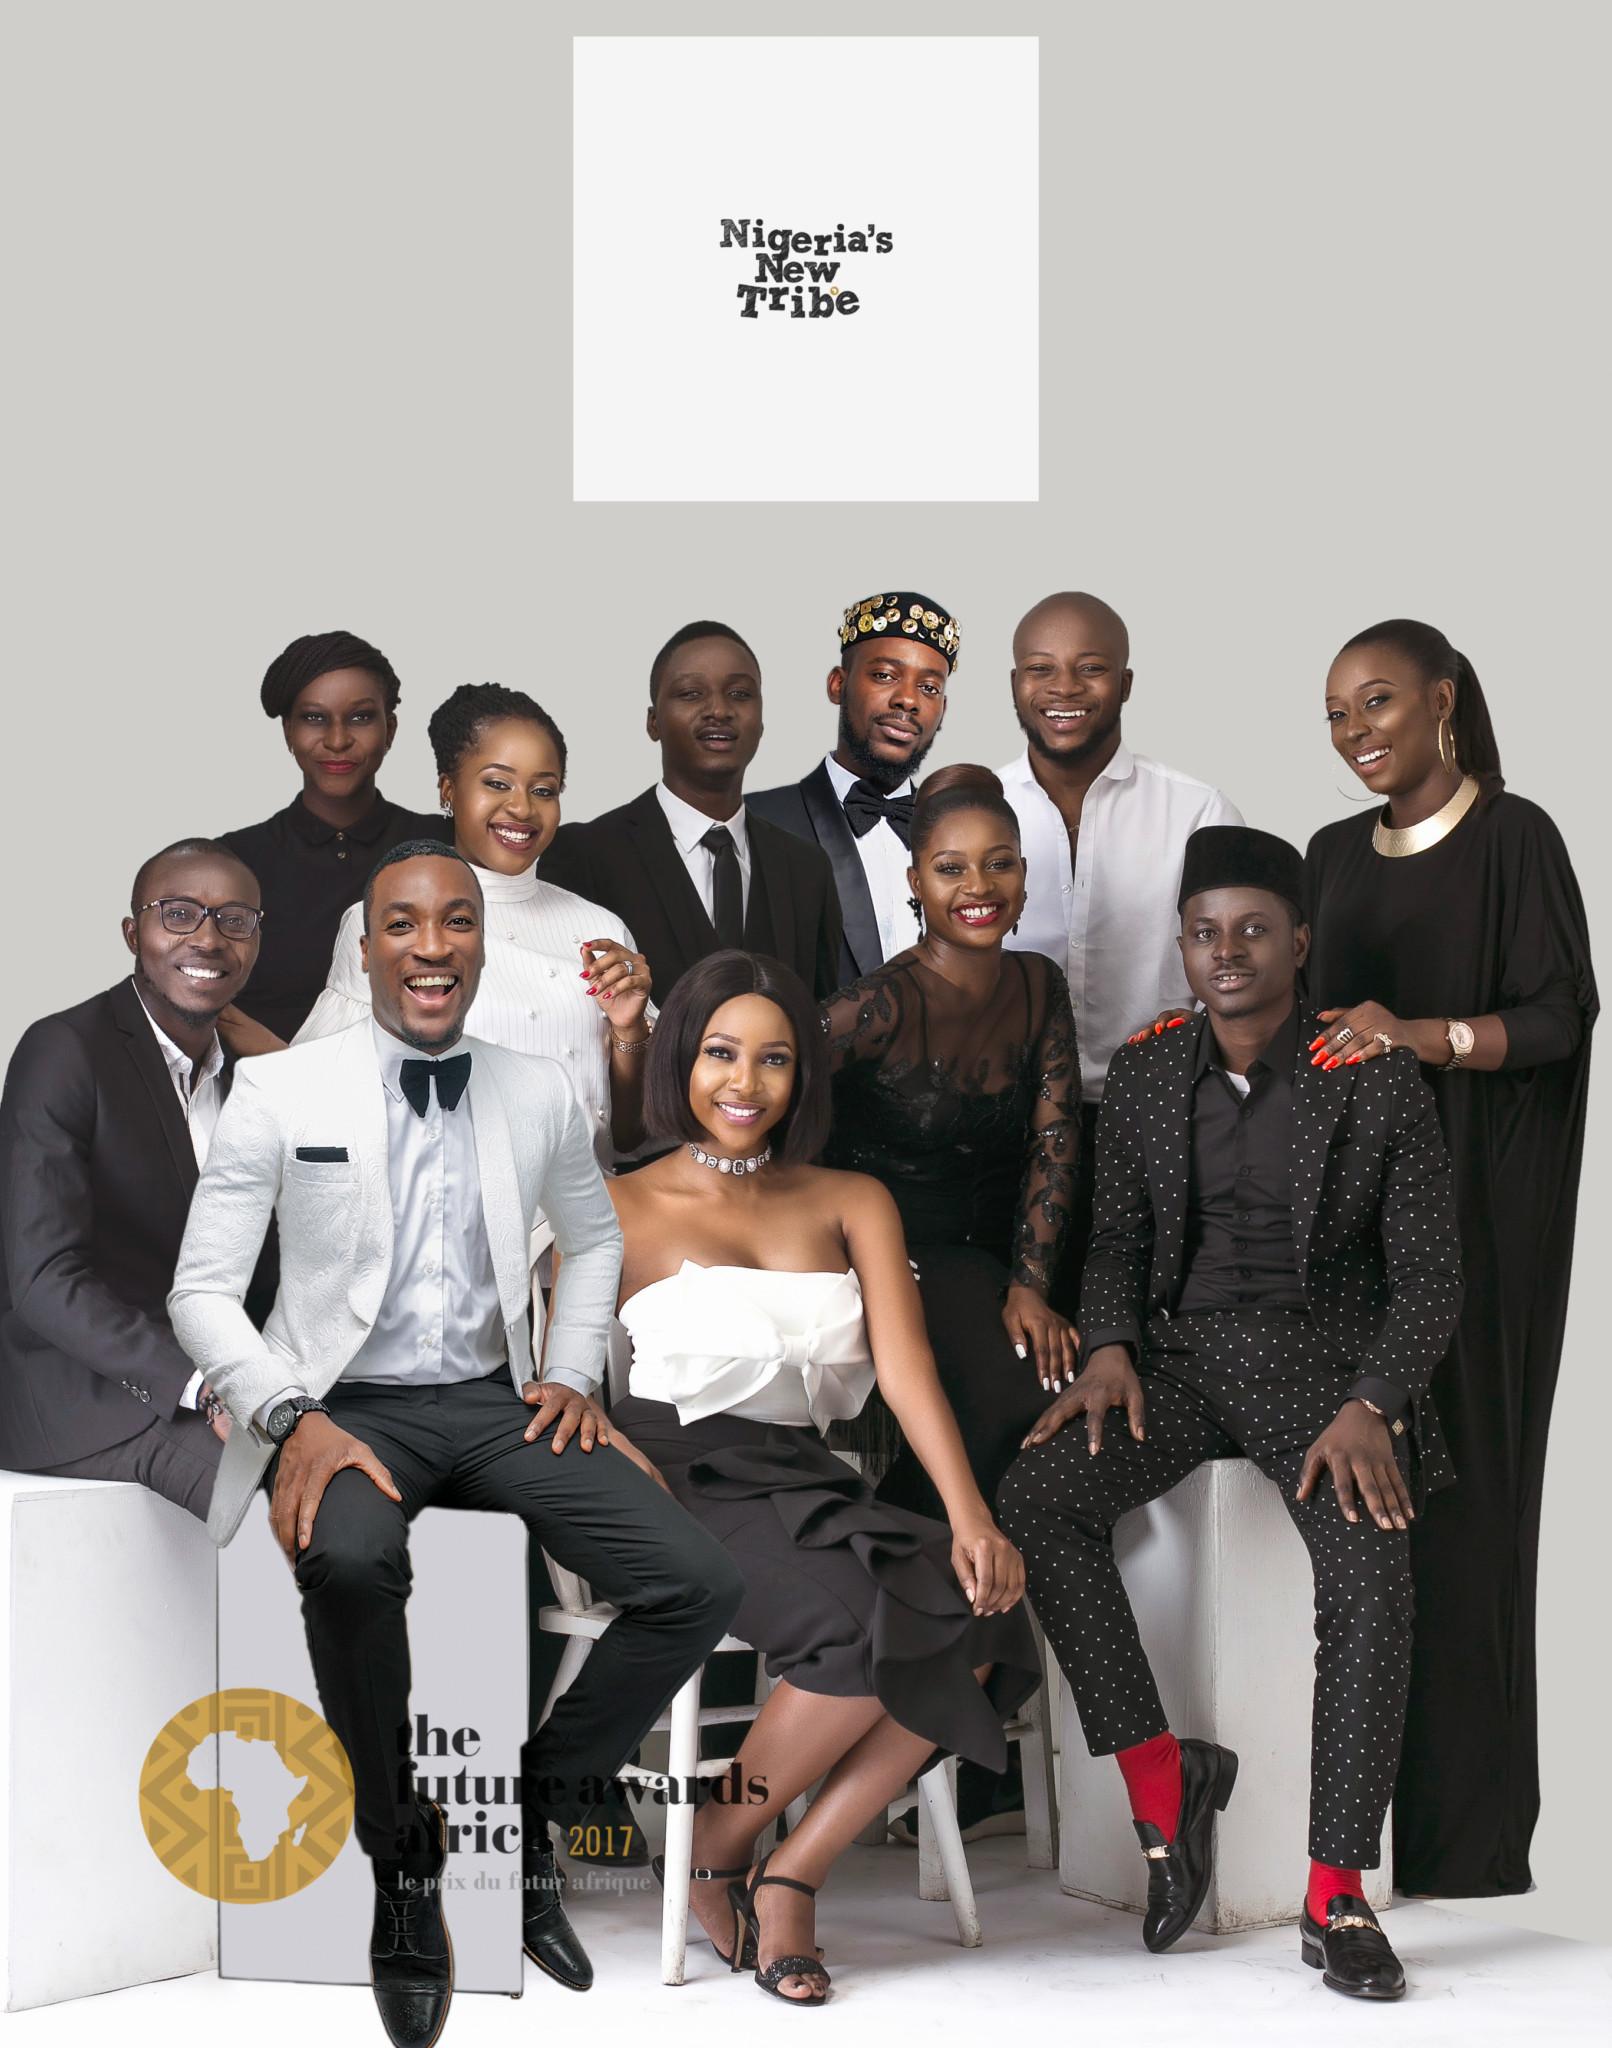 #NigeriasNewTribe: Wizkid, Ini Dima-Okojie, Simi, Davido nominated for The Future Awards Africa 2017 | See Full List